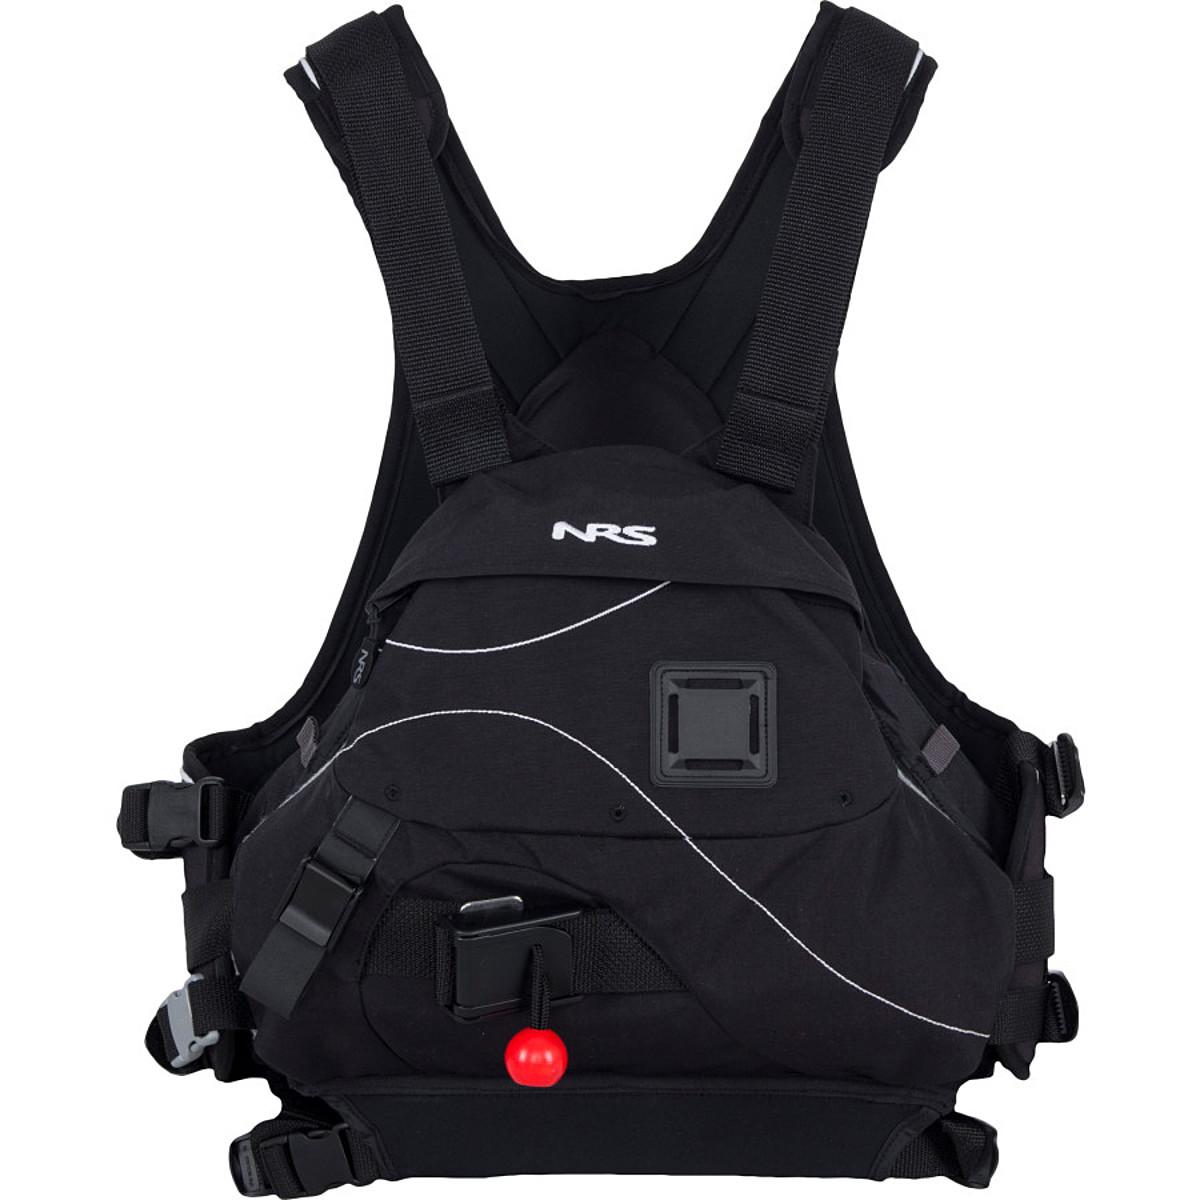 NRS Zen Rescue Life Jacket